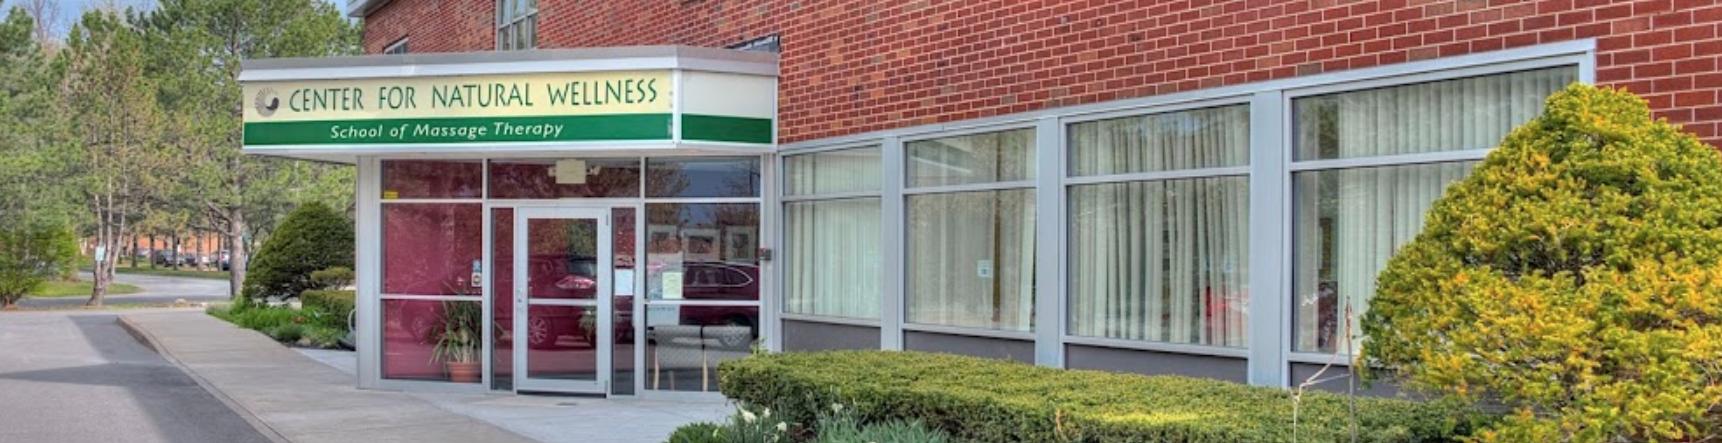 Center for Natural Wellness